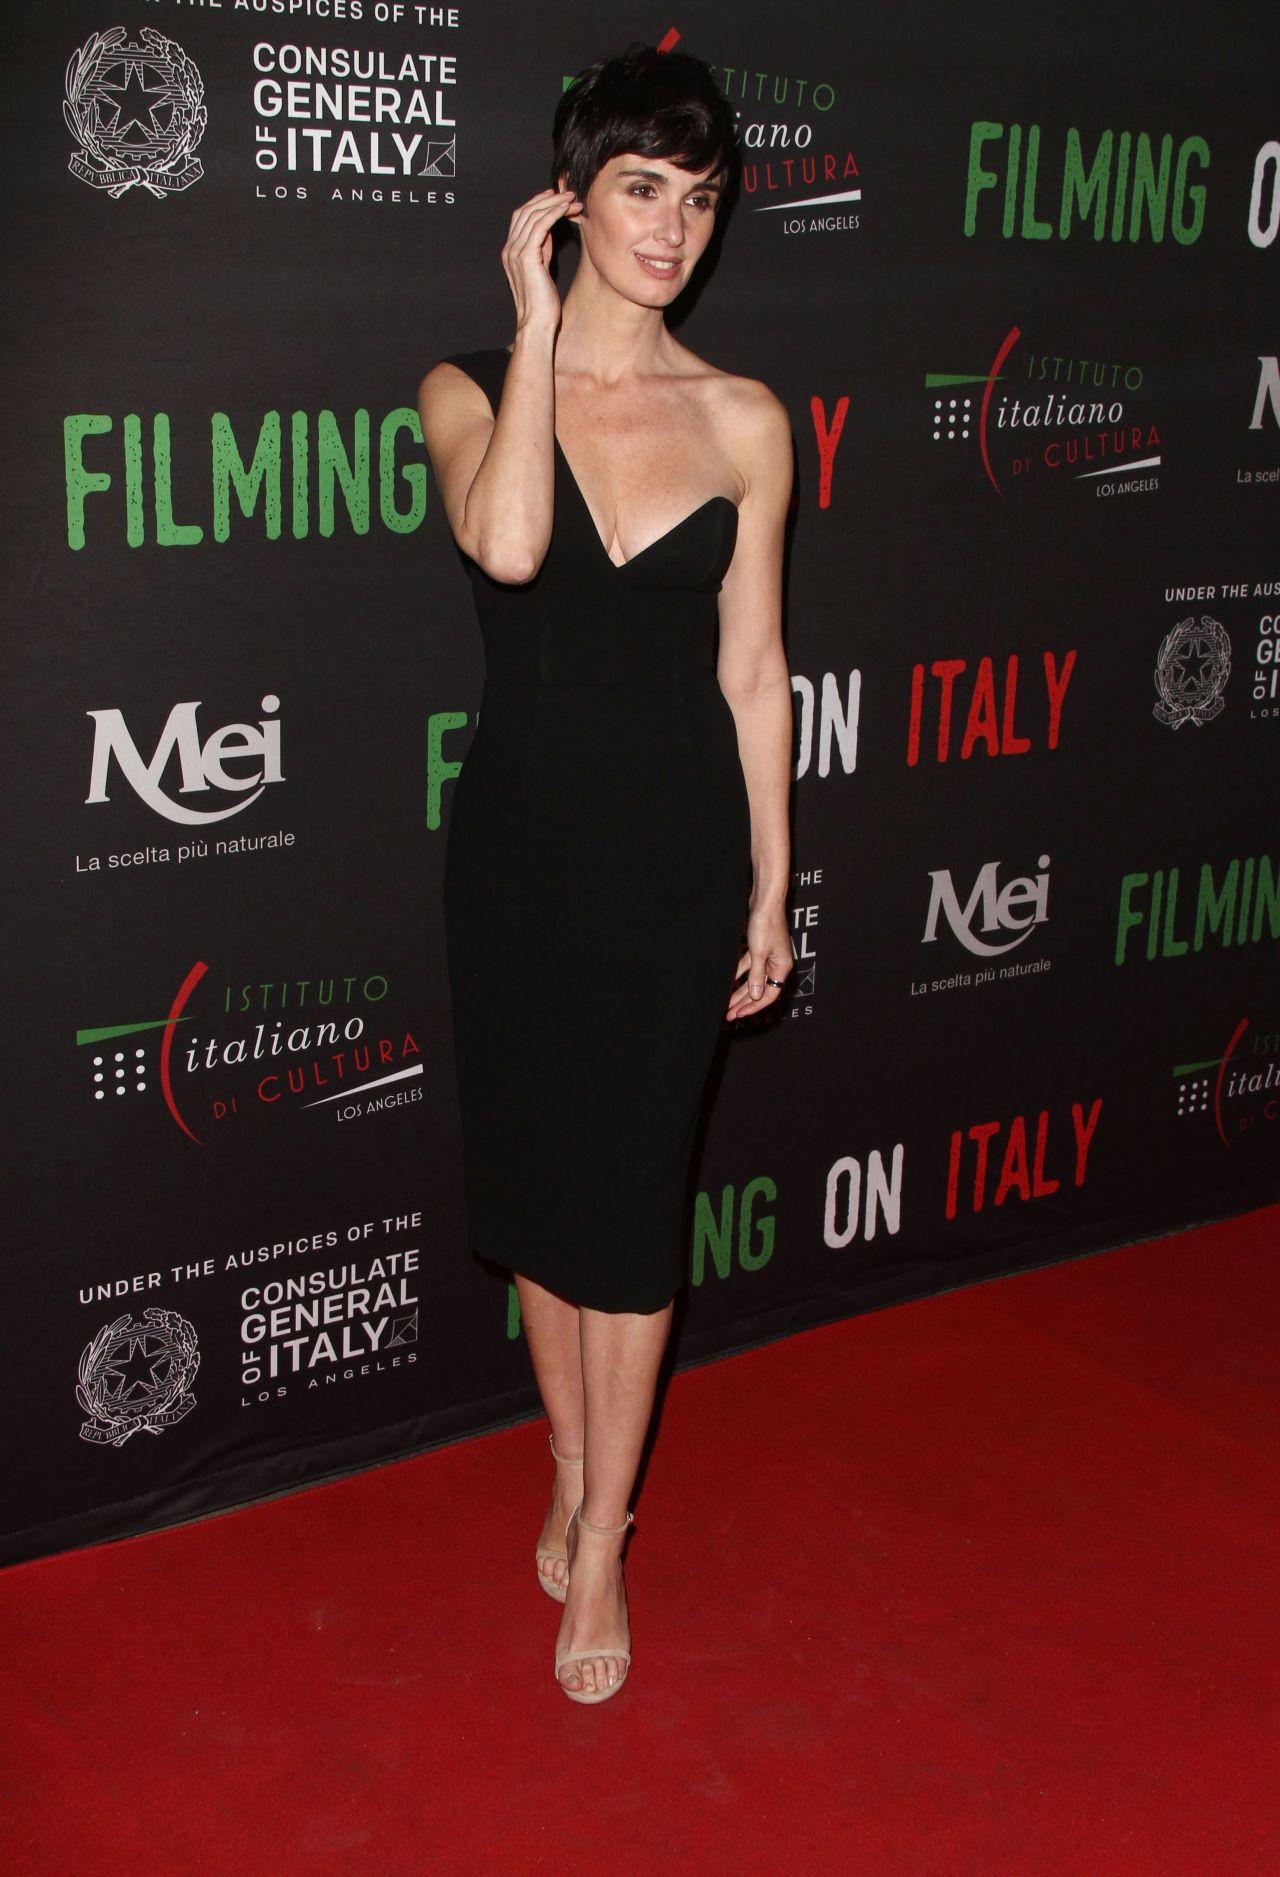 http://celebmafia.com/wp-content/uploads/2018/02/paz-vega-italian-institute-of-culture-los-angeles-creativity-awards-2018-5.jpg